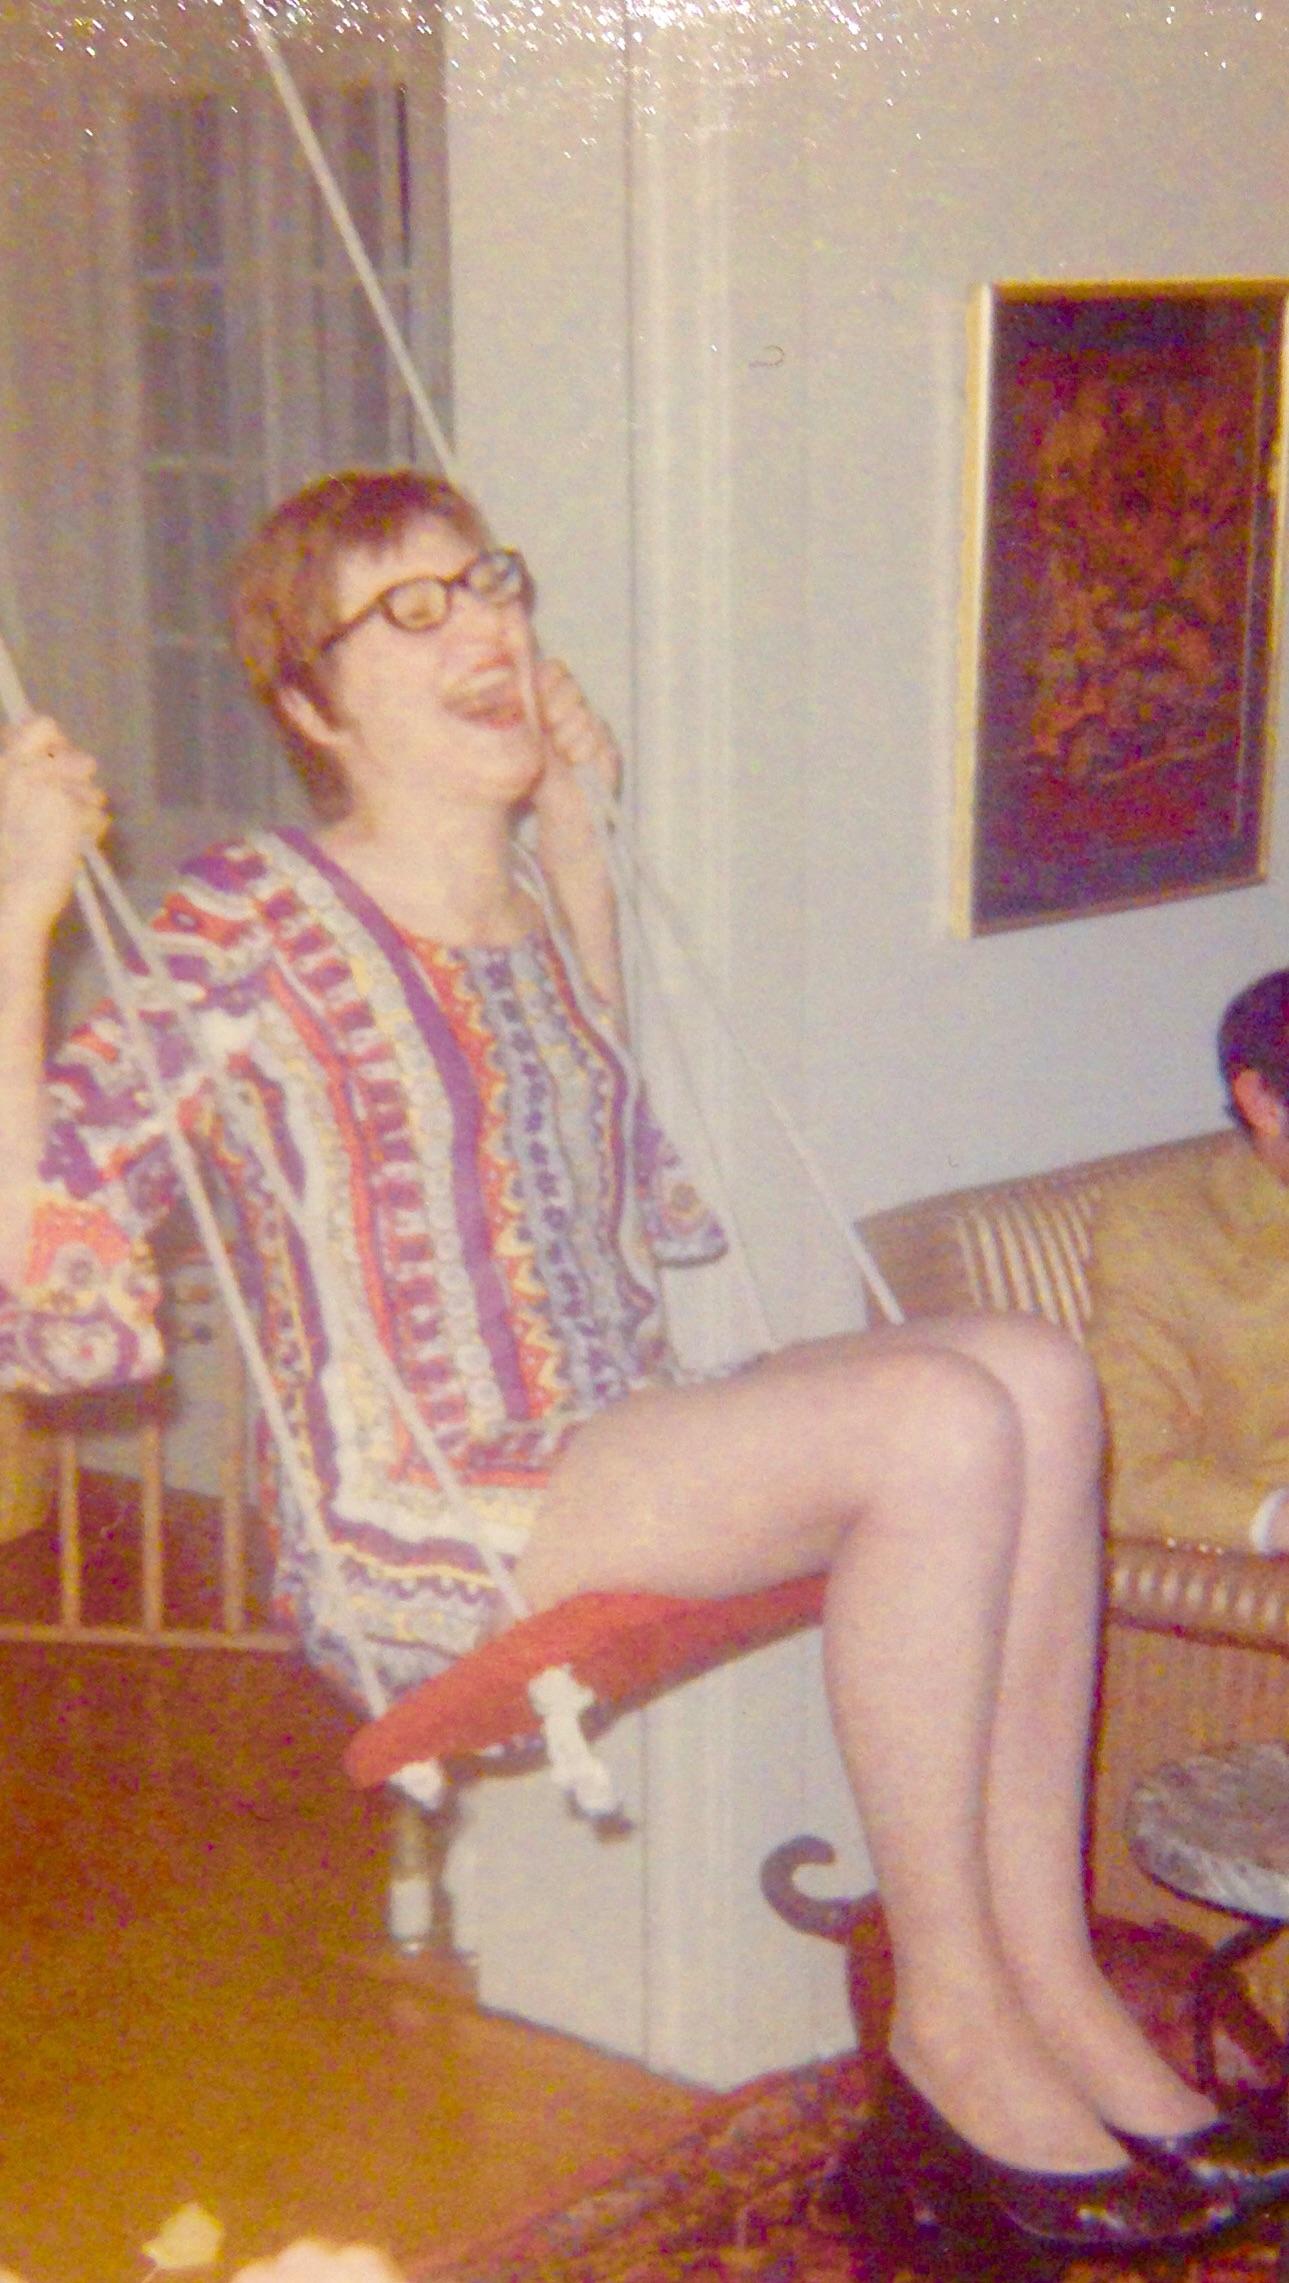 Mother, minidress, swing, 1969?